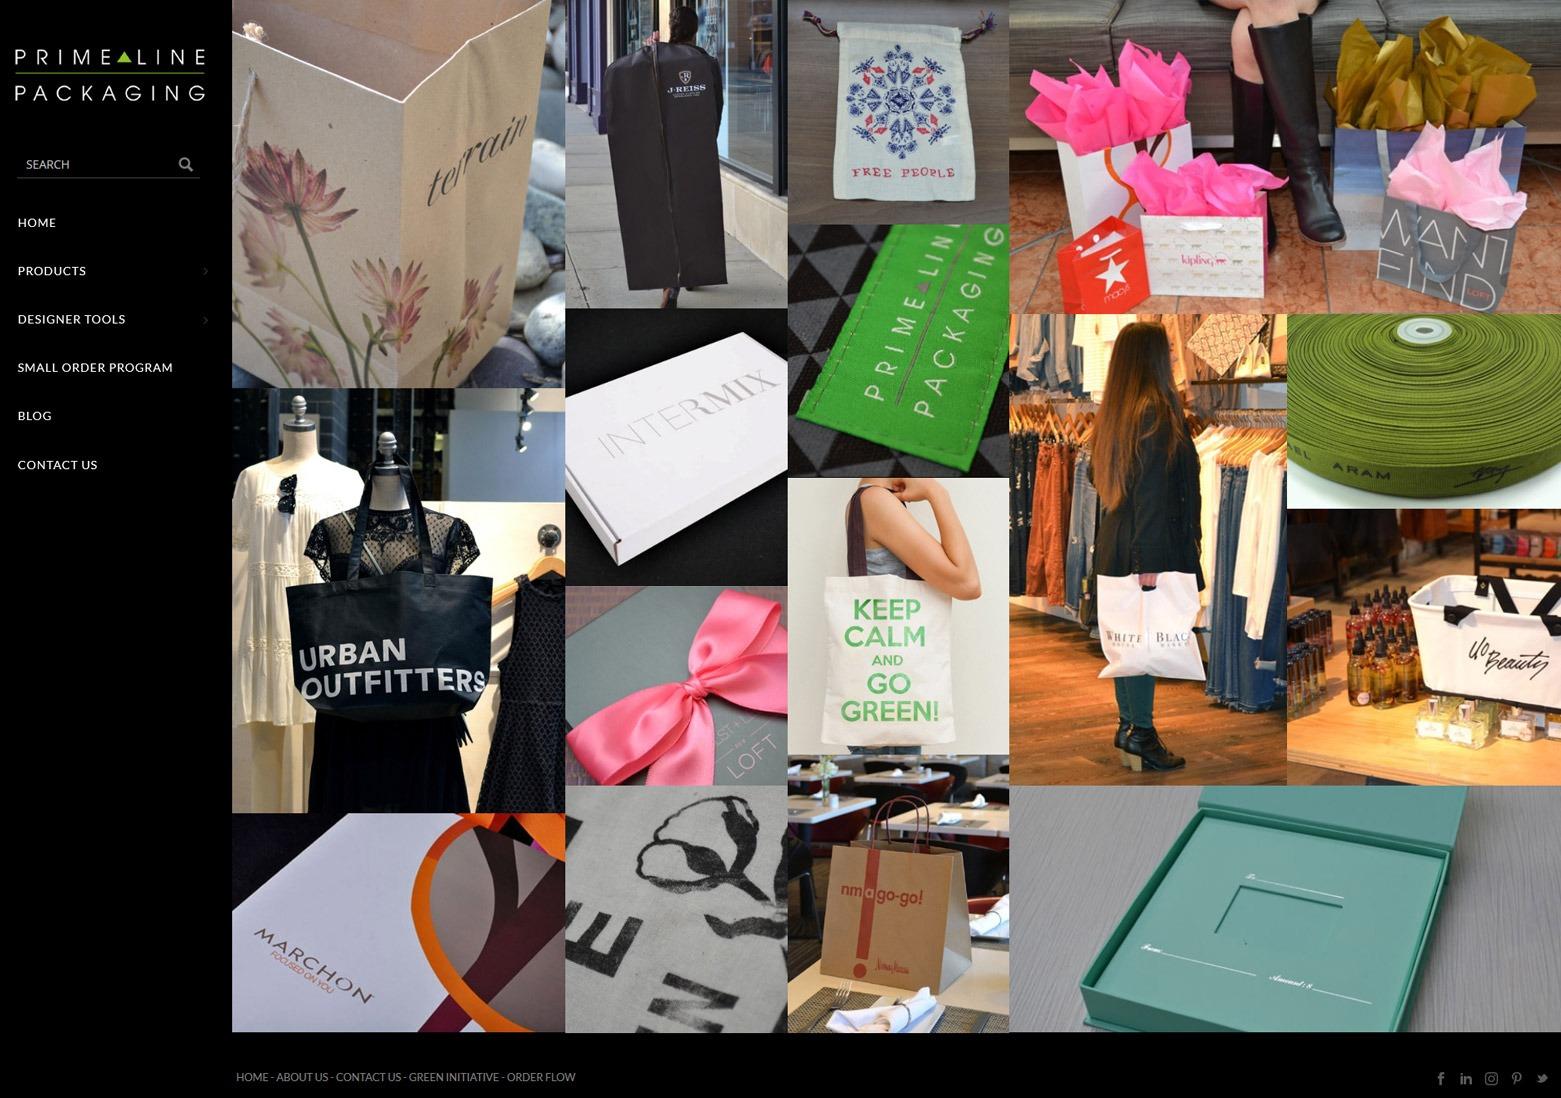 LA Angeles Packaging Web Design Company